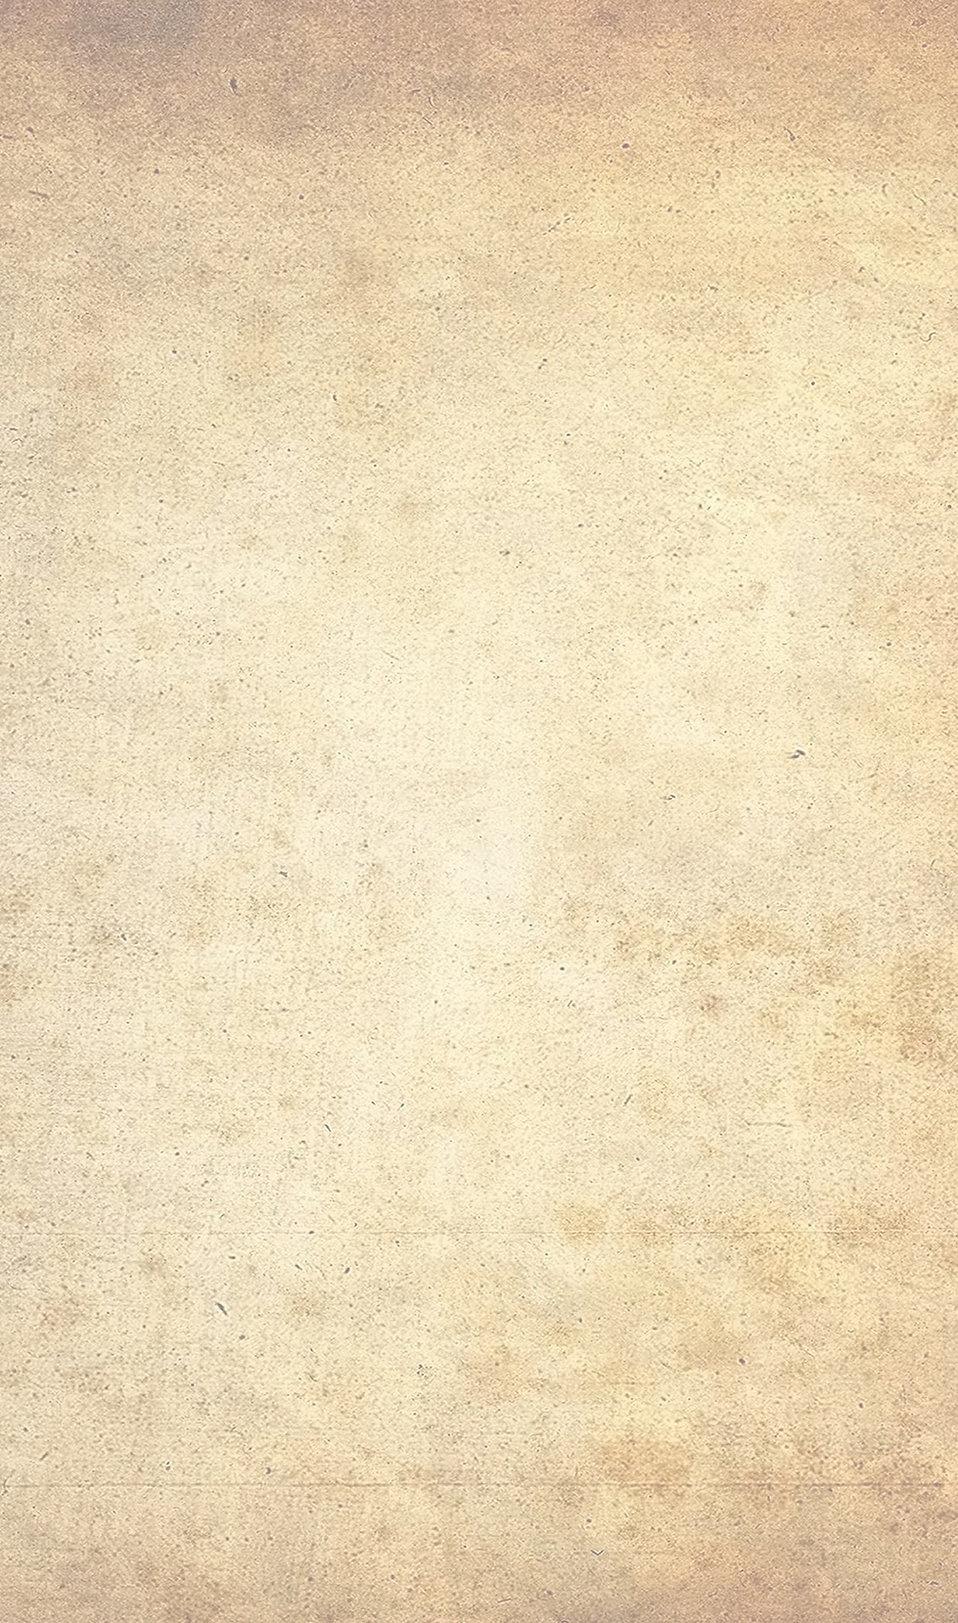 Papyrus 2a.jpg